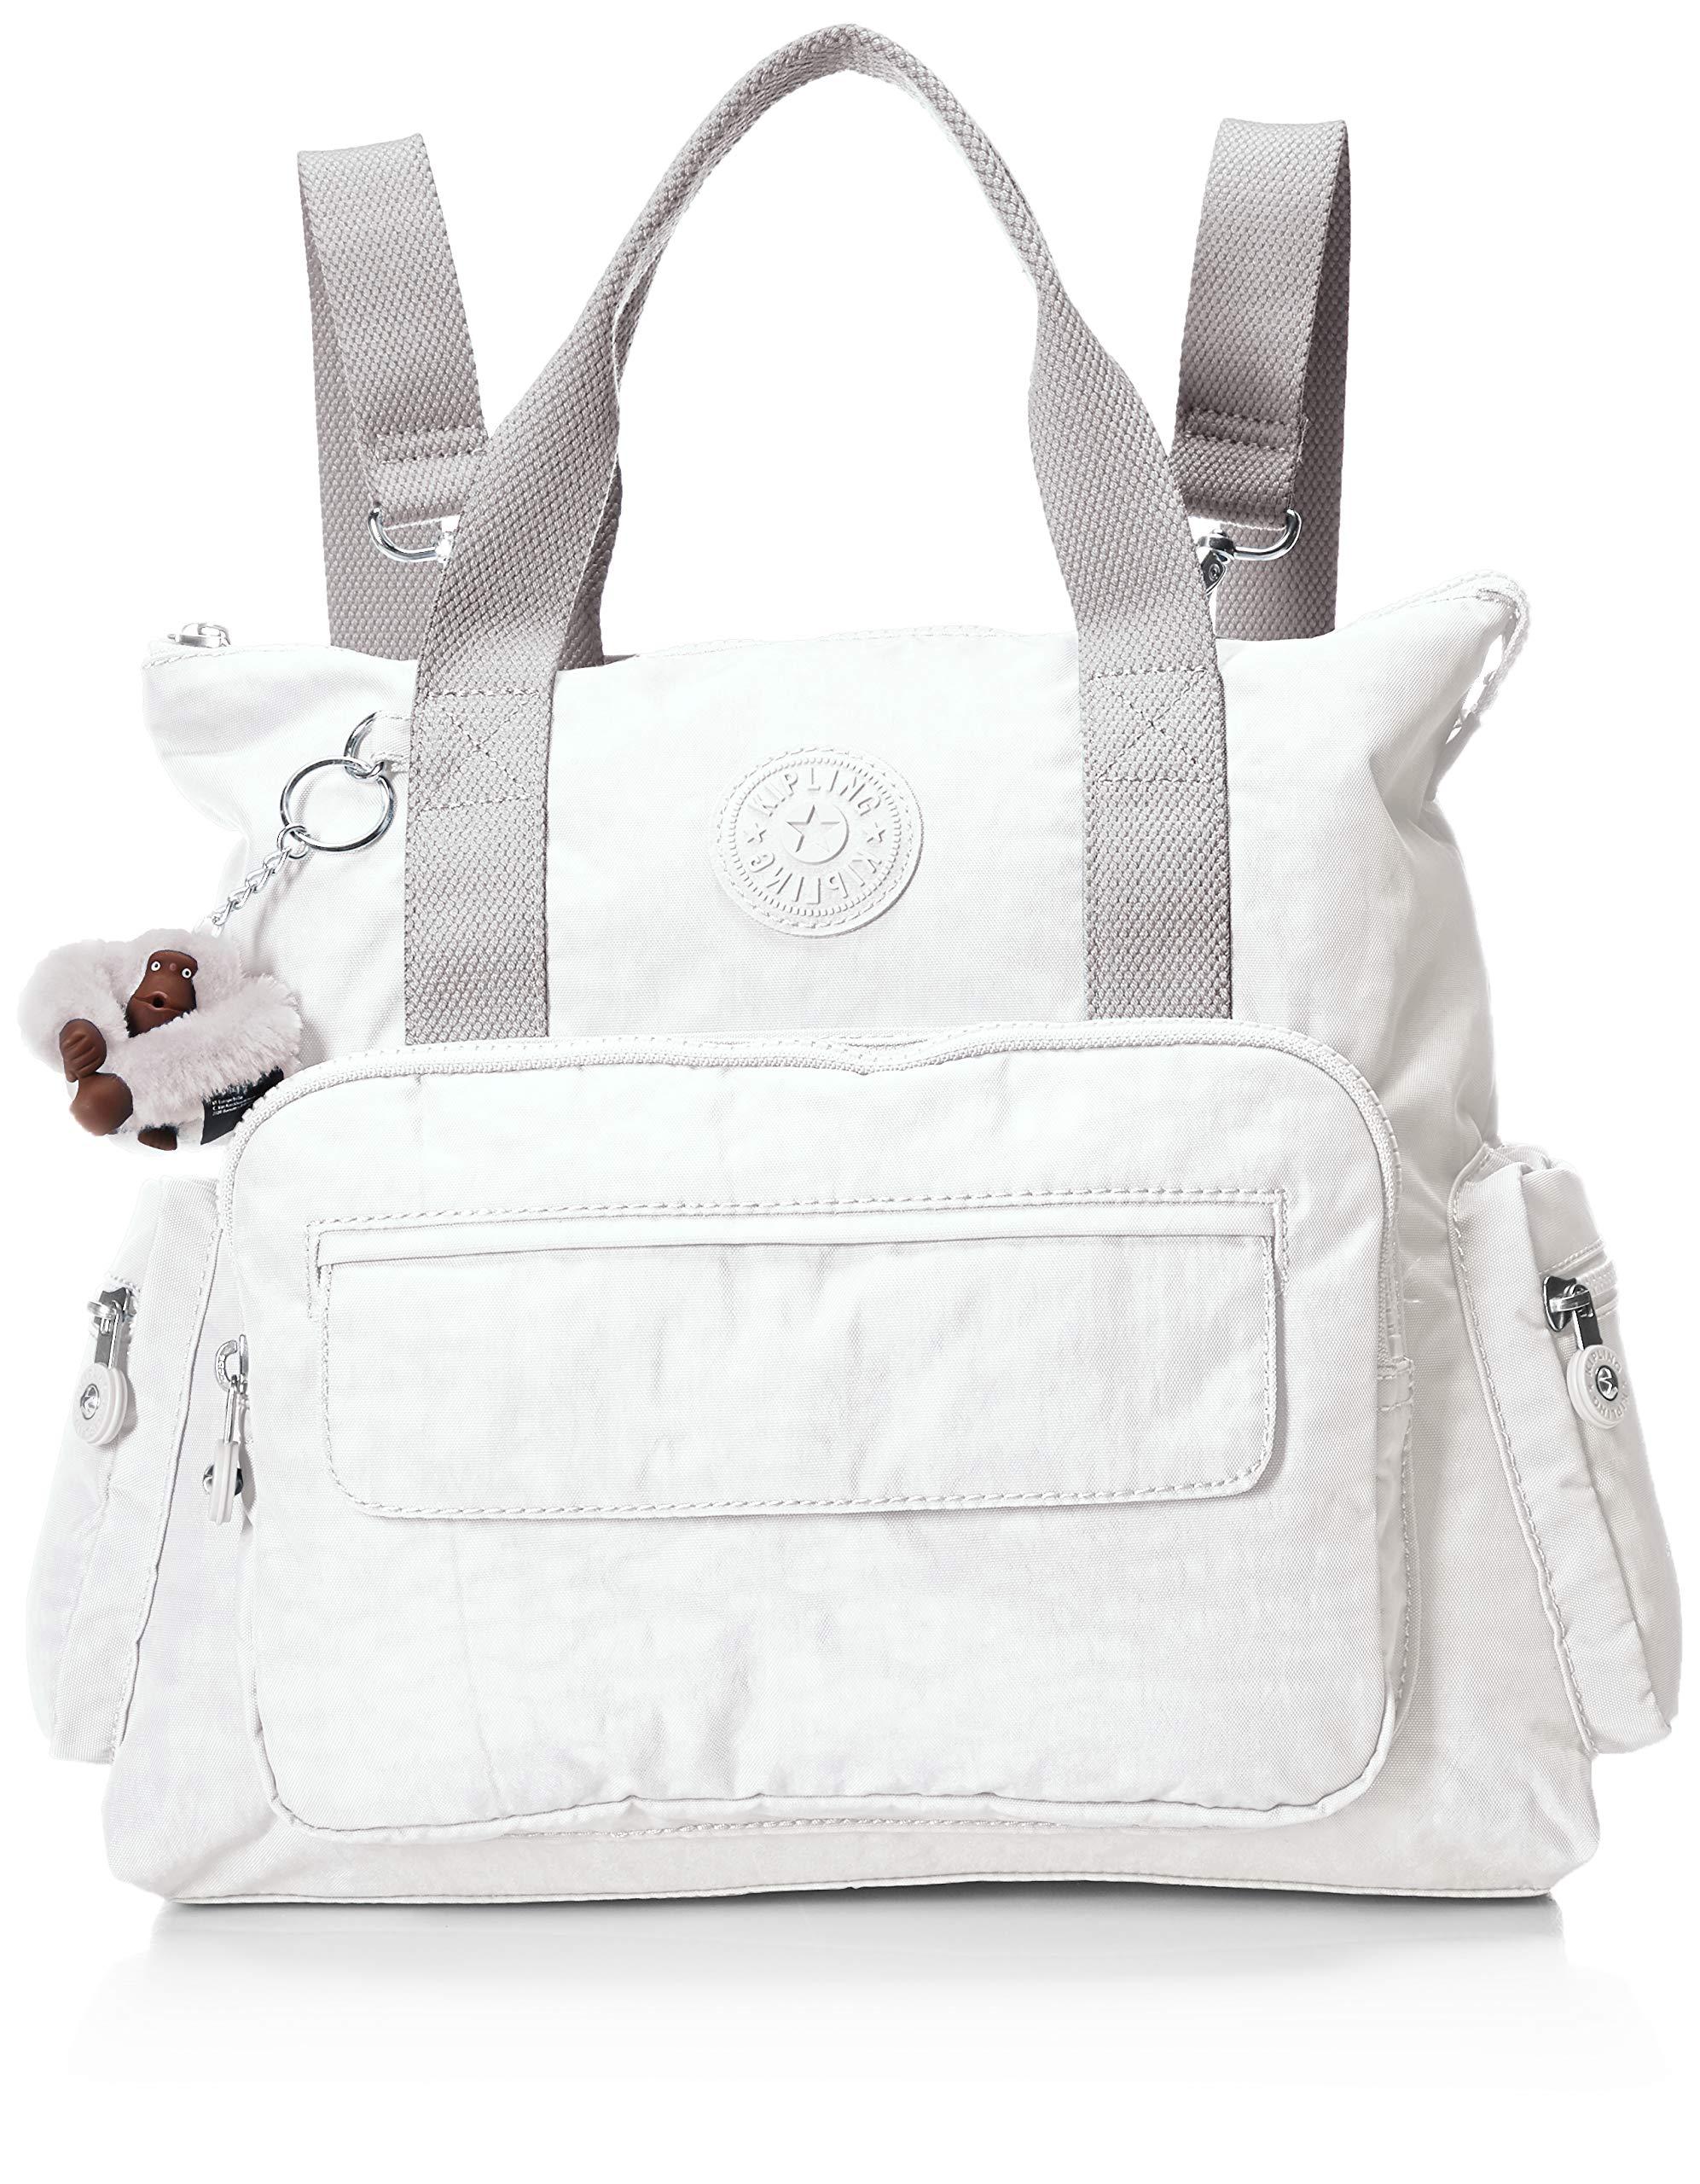 Kipling Women's Alvy 2-in-1 Convertible Tote Bag Backpack, Wear 2 Ways, Zip Closure, Alabaster Tonal